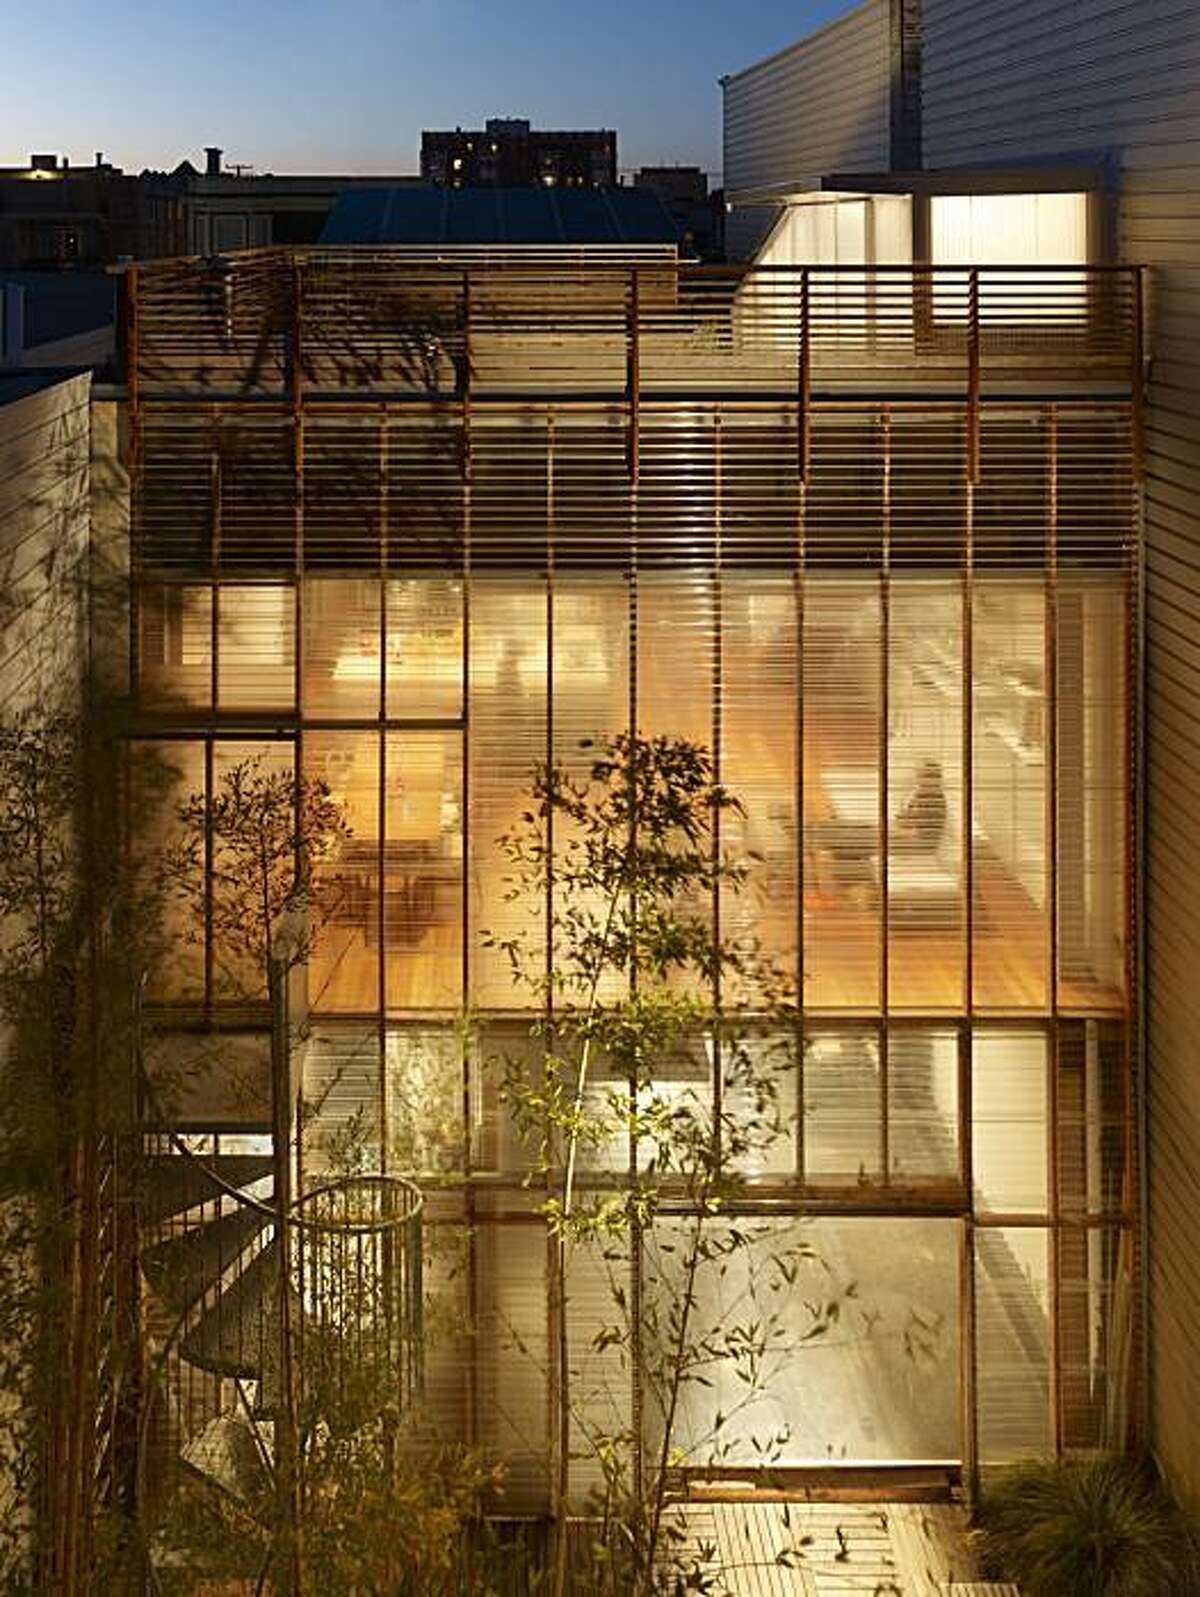 Mission House garden facade - night.jpg